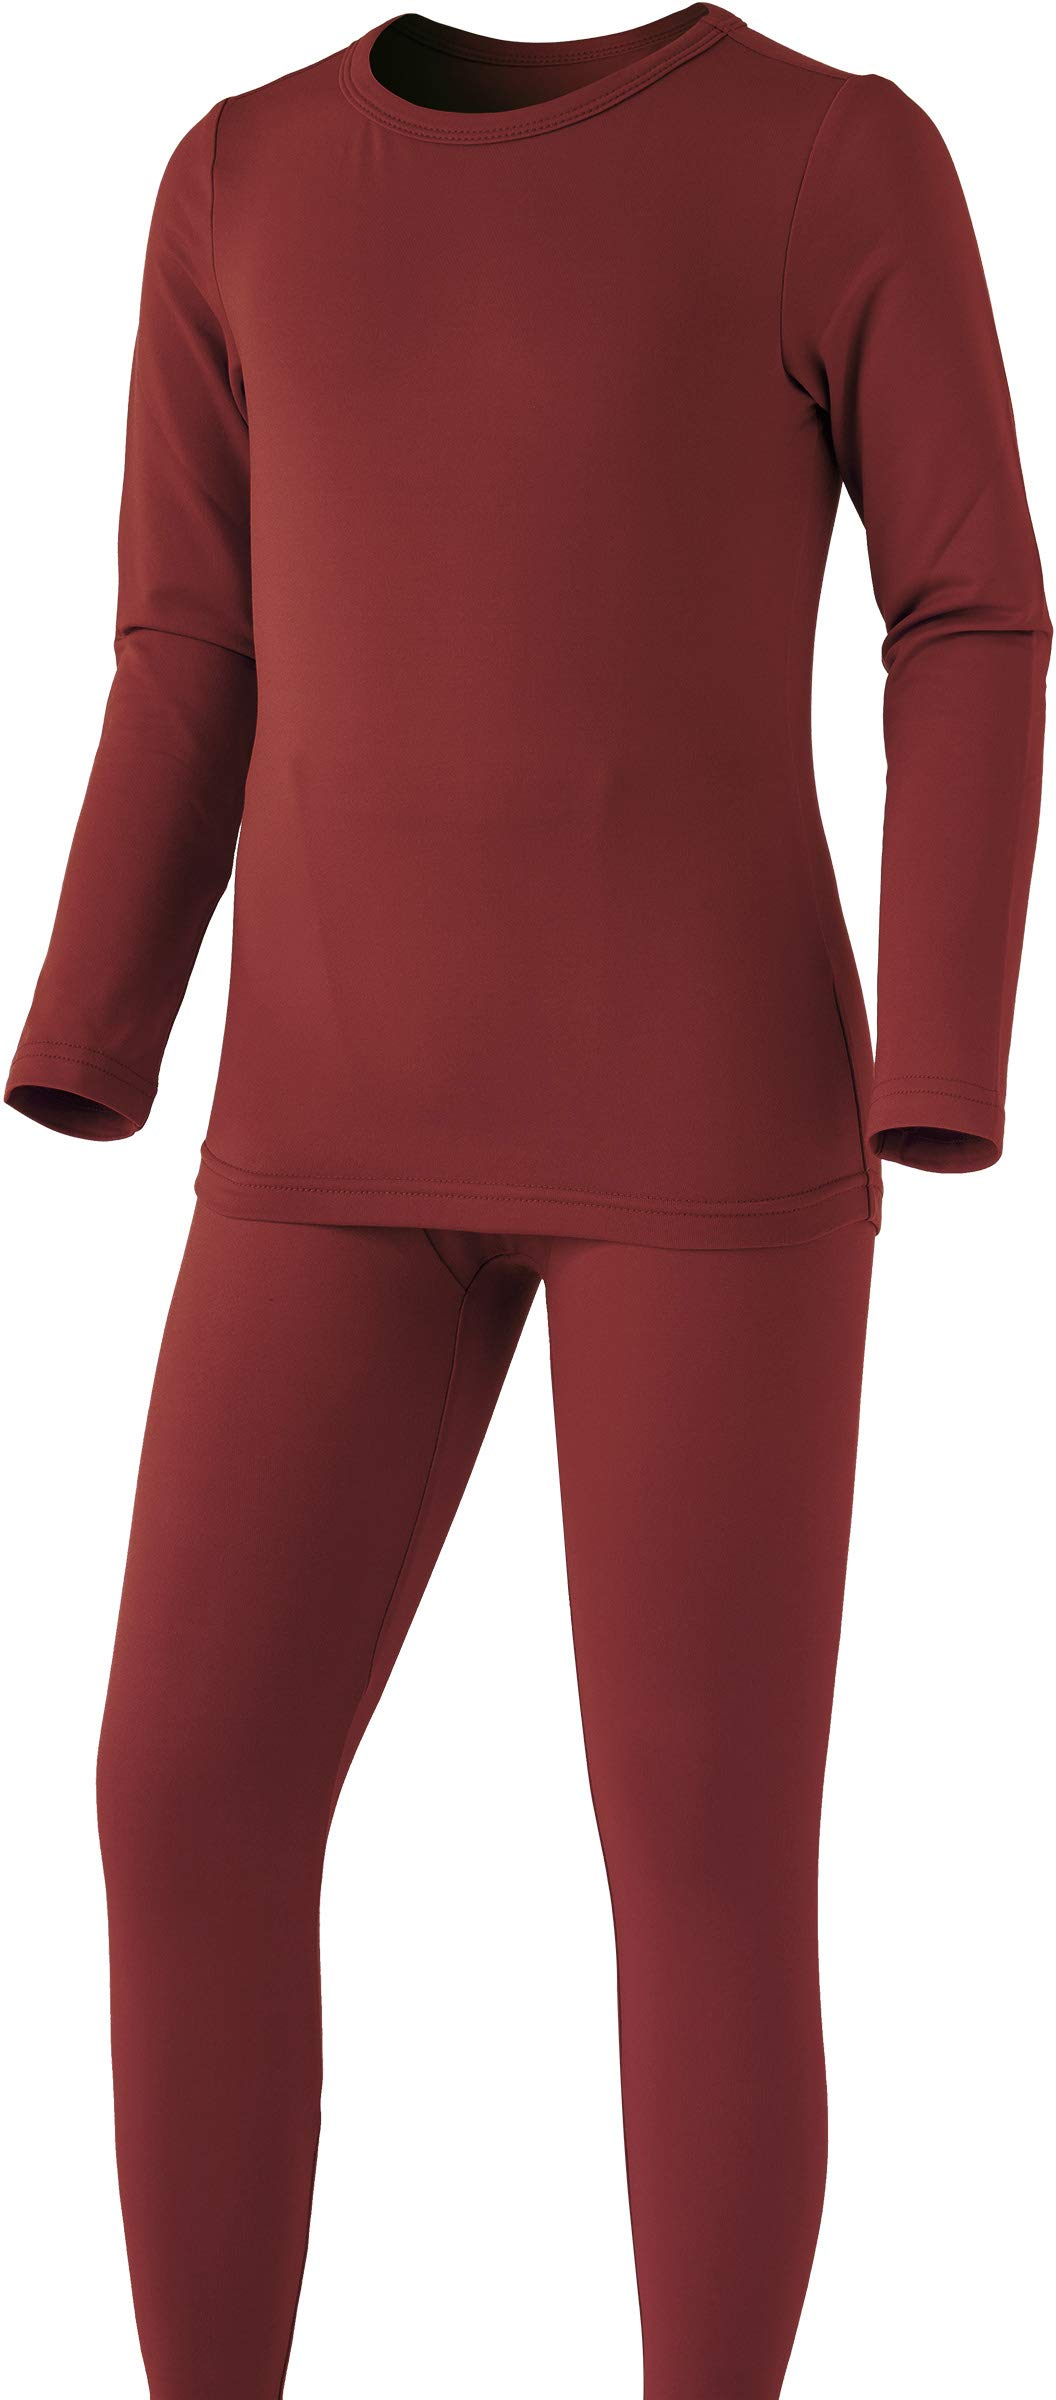 TSLA Boy's Microfiber Soft Fleece Lined Warm Thermal Top & Bottom Set, Boy Set(khs300) - Brick, Large (Height 5ft1in - 5ft5in) by TSLA